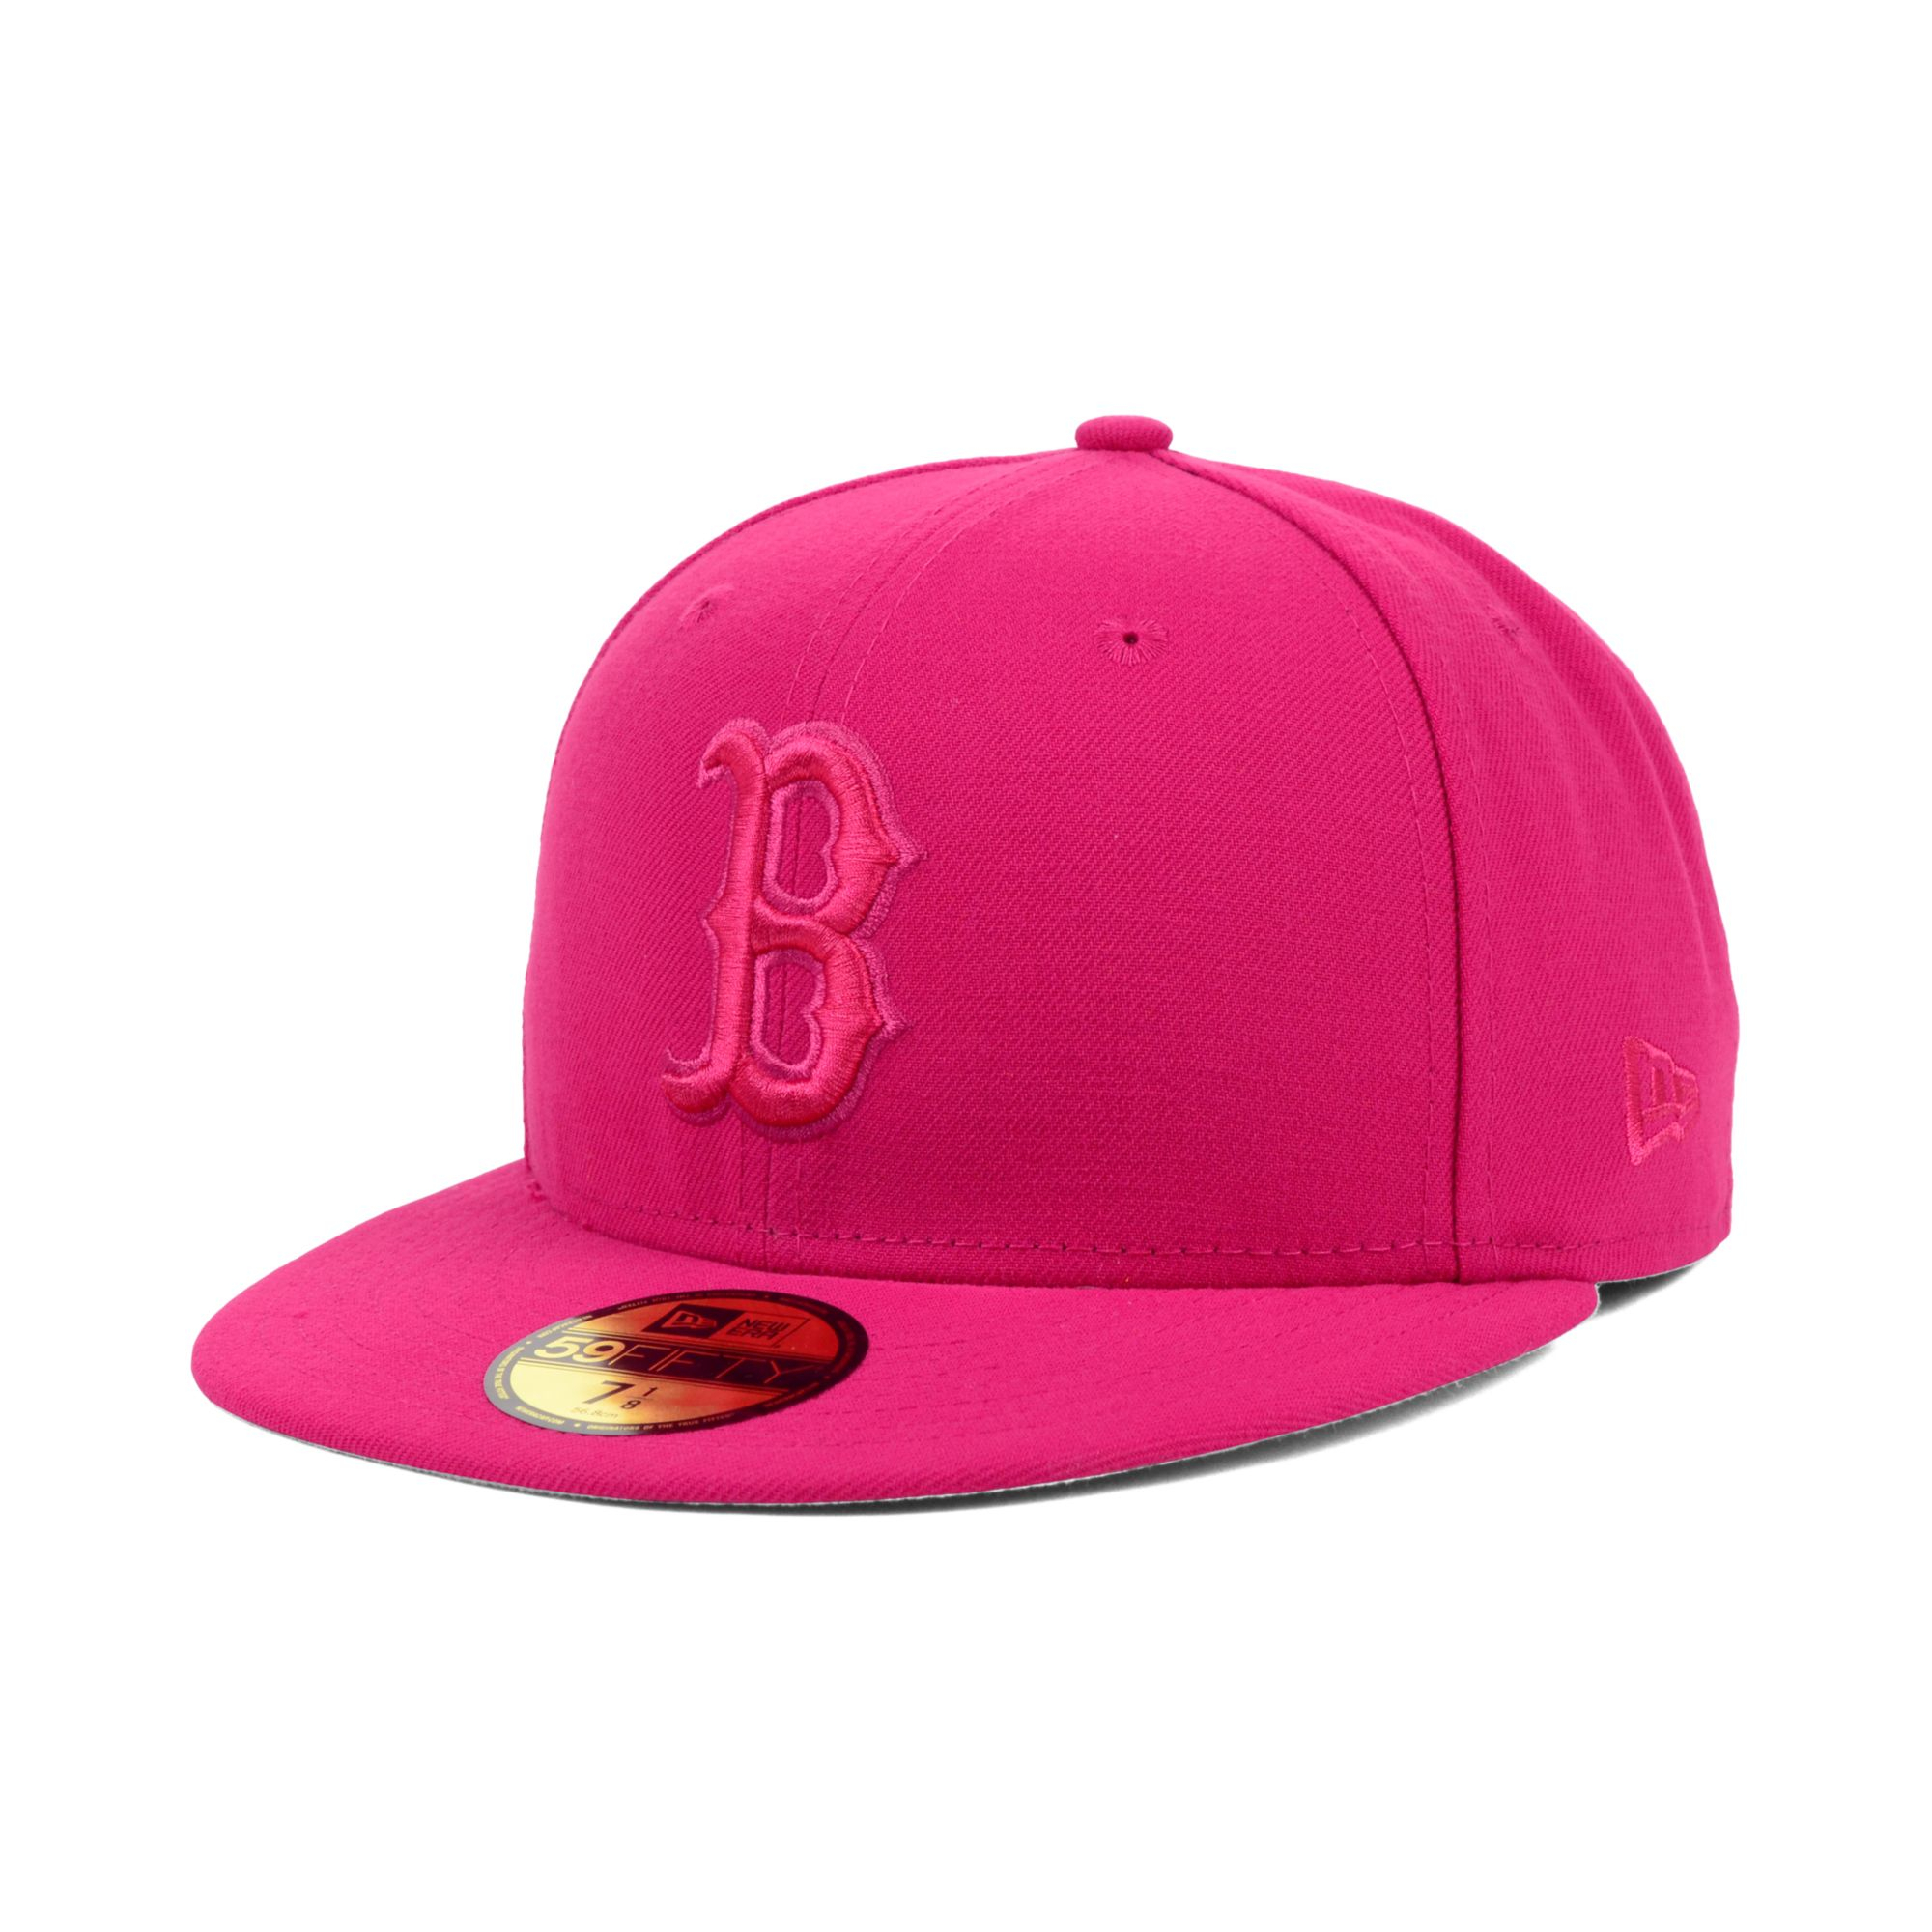 Ktz Boston Red Sox Pop Tonal 59fifty Cap In Pink Lyst